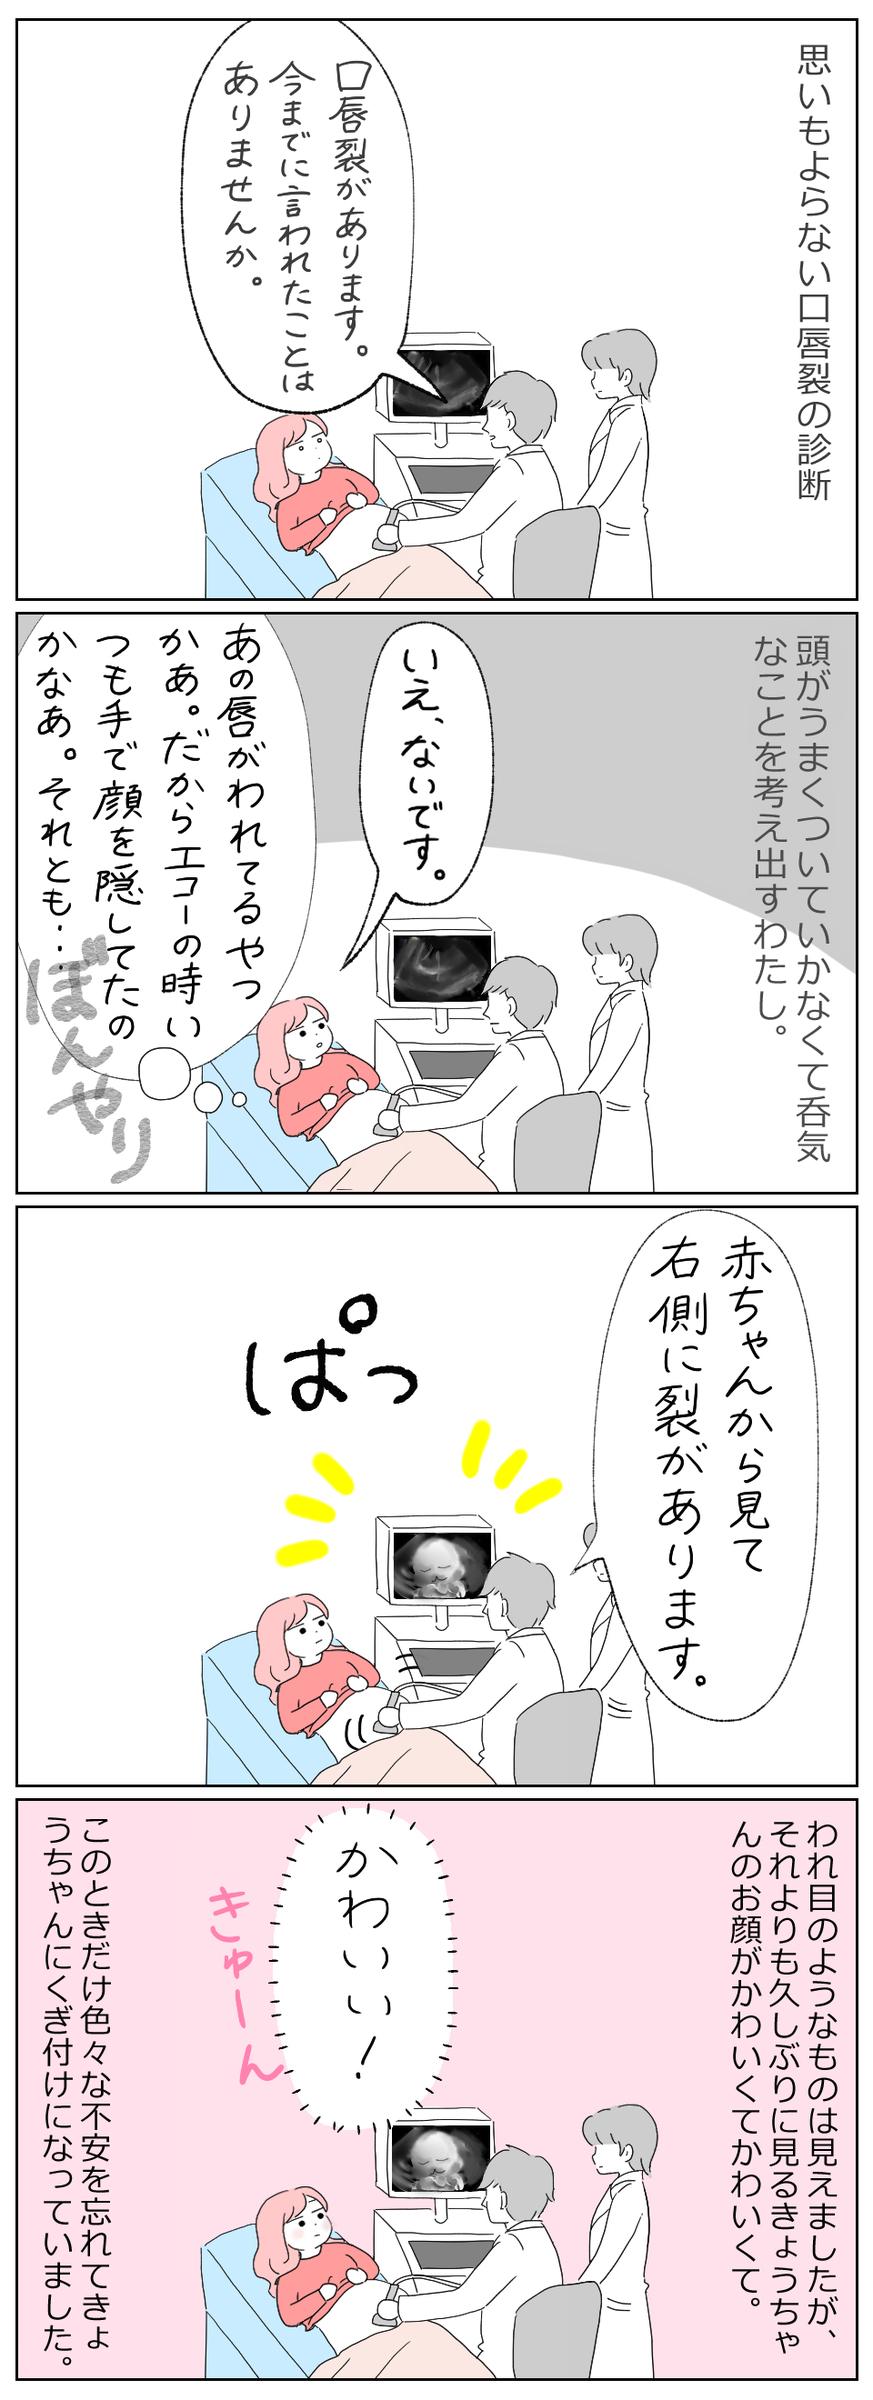 f:id:kayarimo:20190315220414j:plain